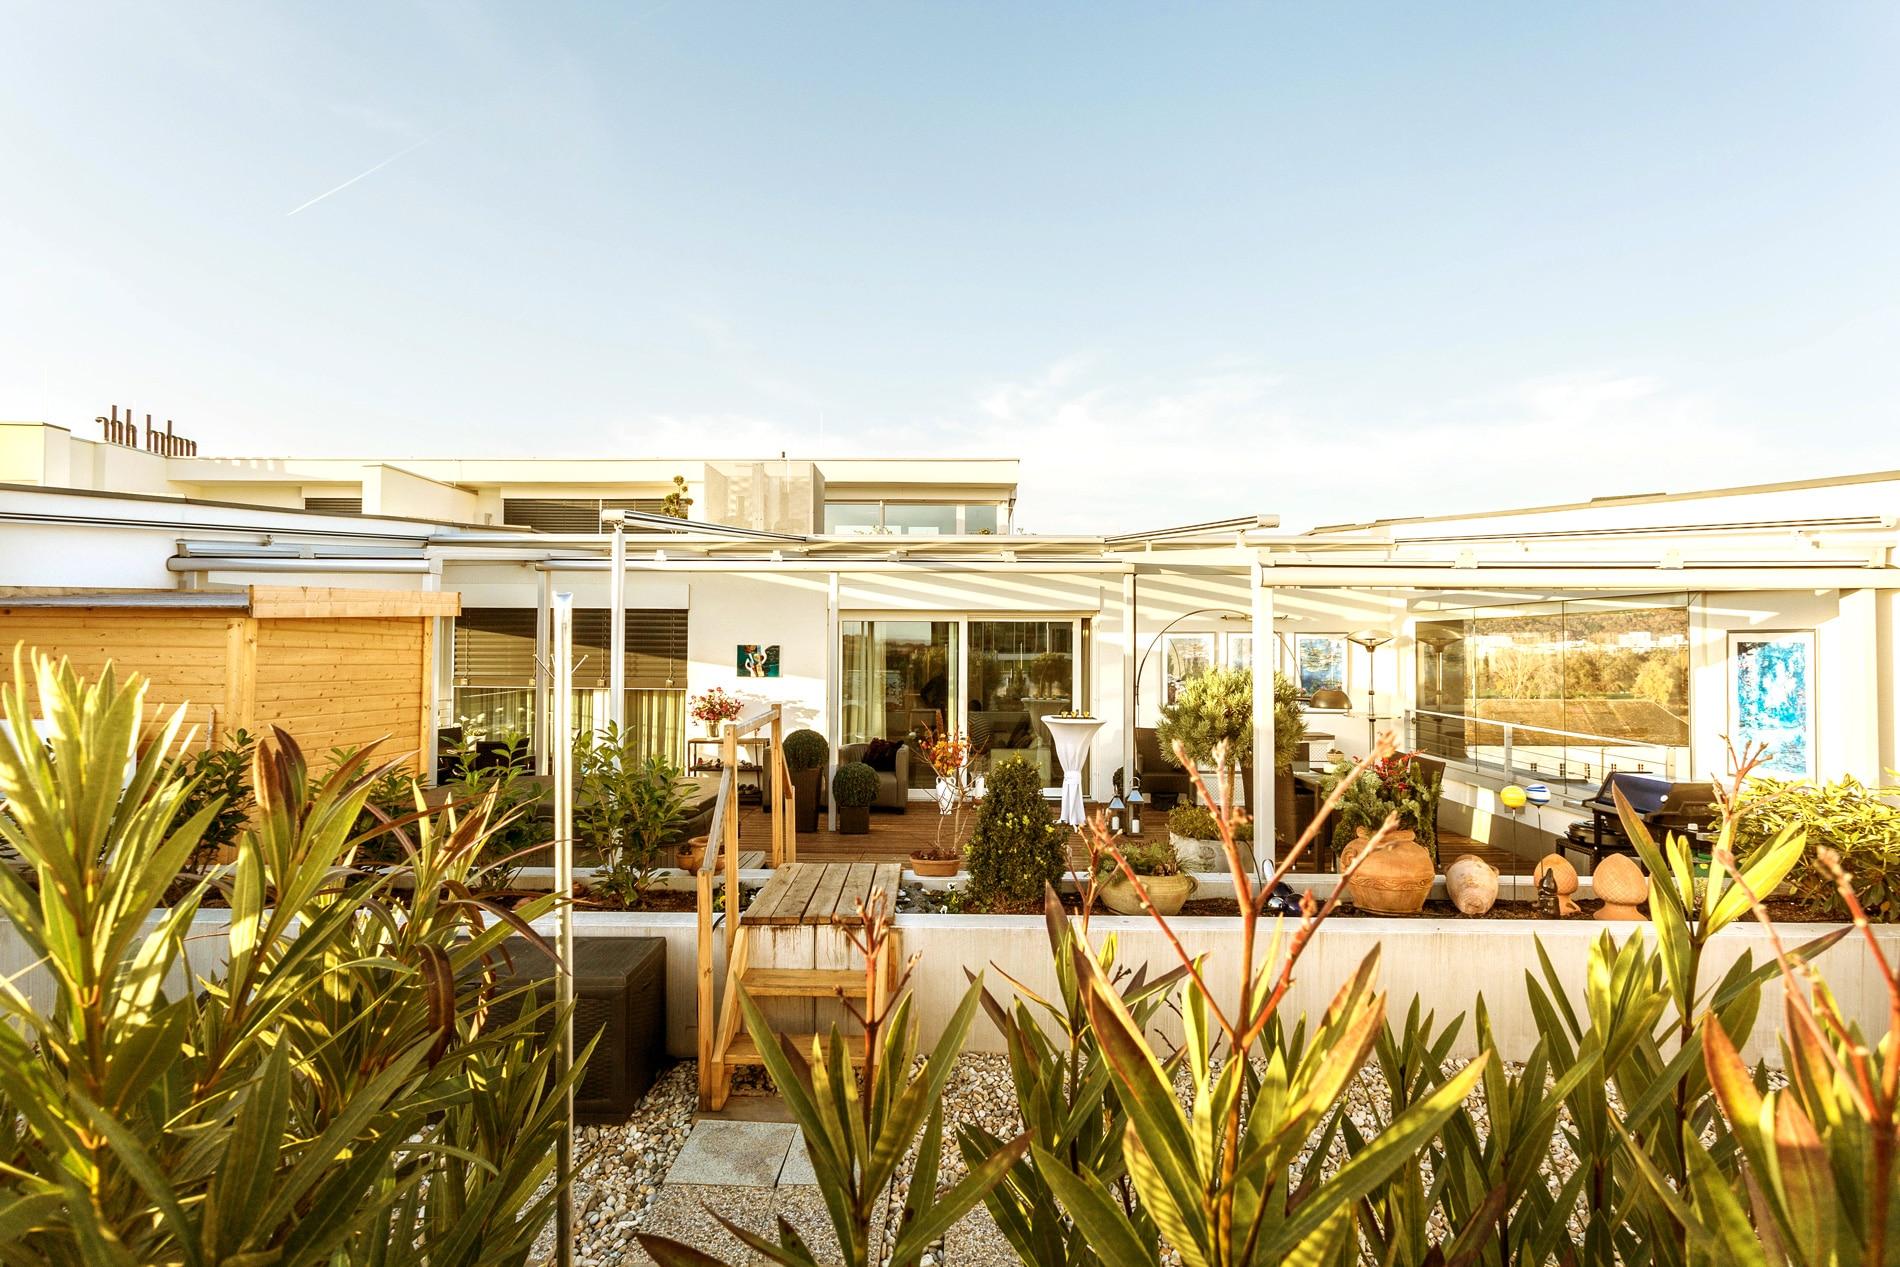 terrasse mit glasdach rivera with terrasse mit glasdach affordable gallery of neu designe. Black Bedroom Furniture Sets. Home Design Ideas